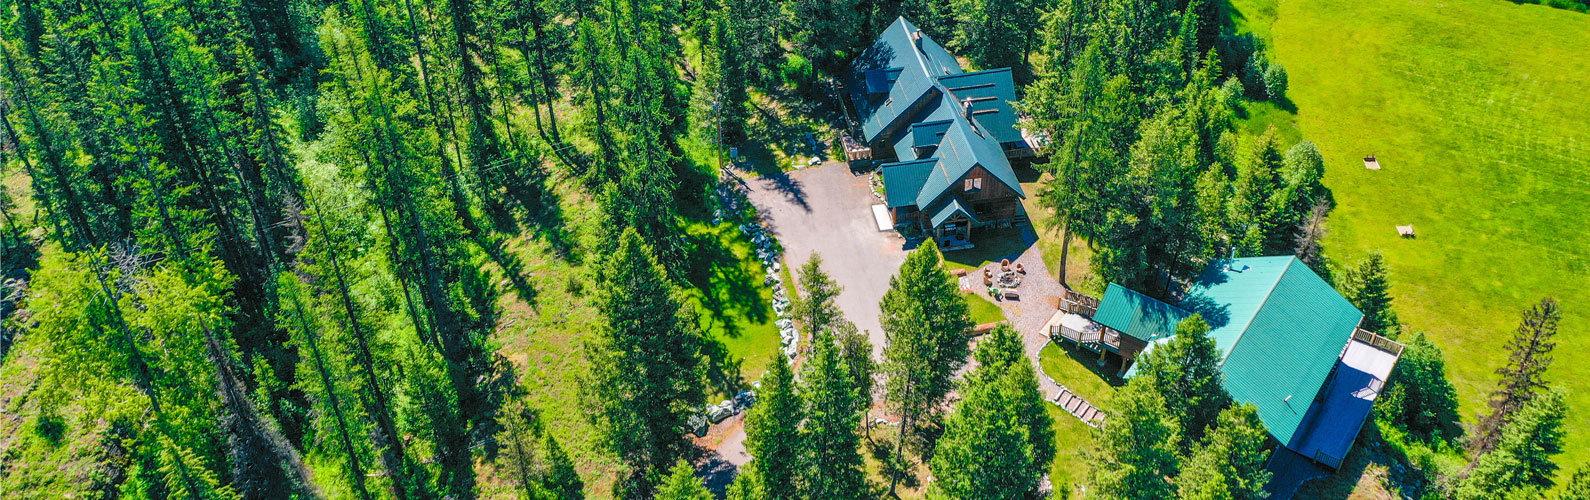 Dog-Creek-Lodge-Contact-Header2.jpg